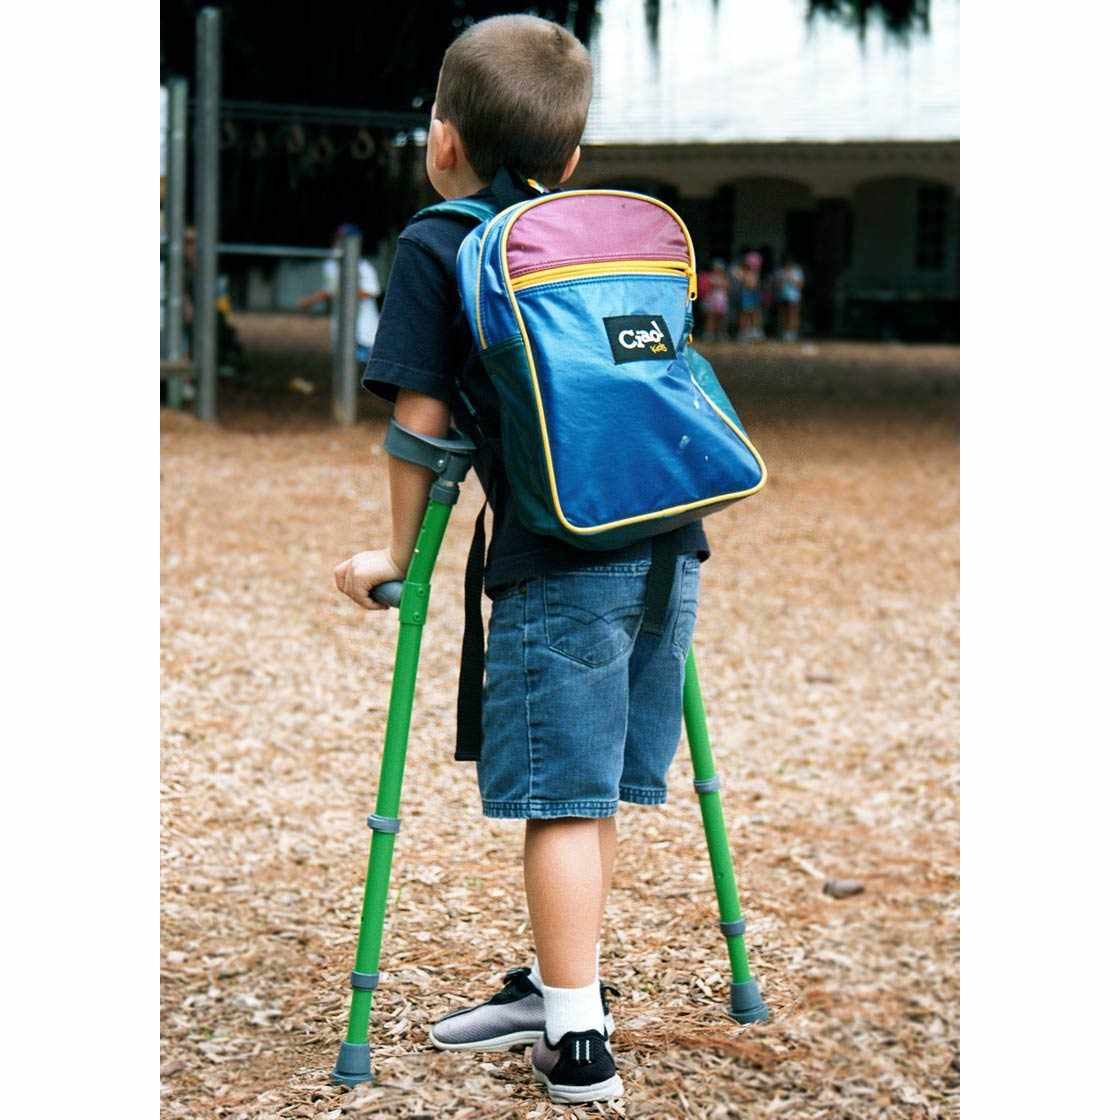 Walk Easy Pediatric Forearm Height Adjustable Crutches -Pair